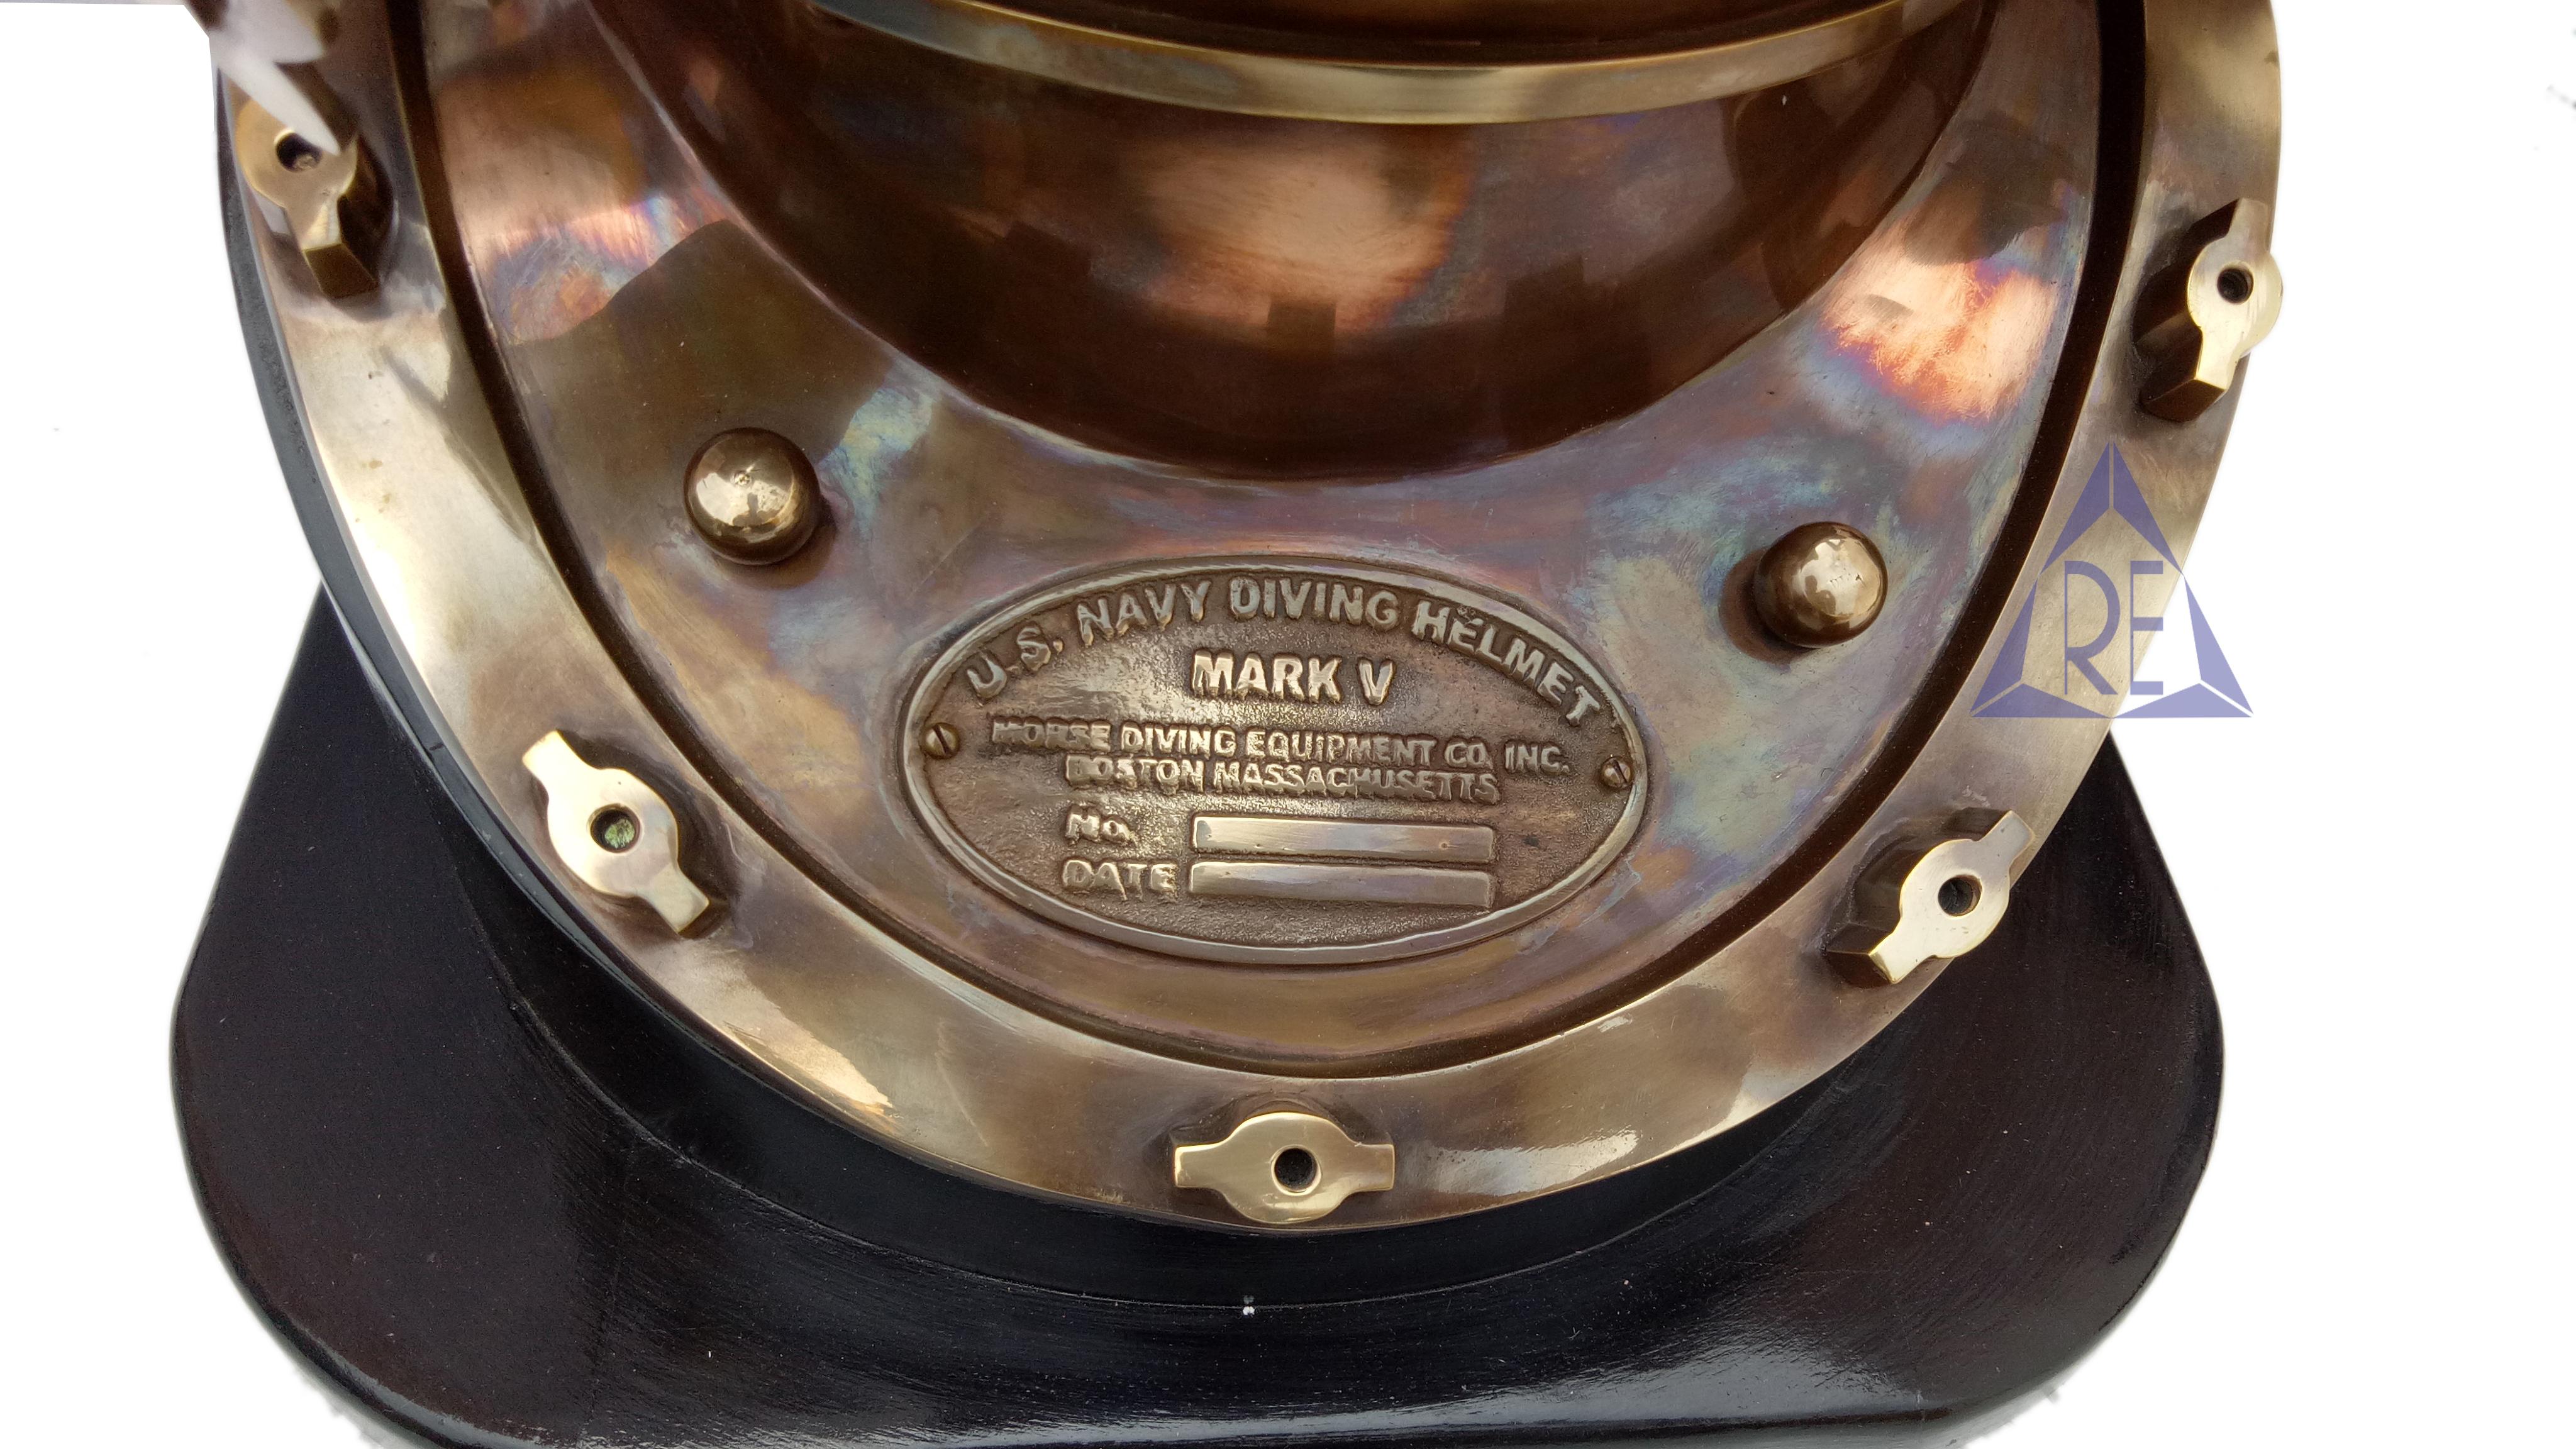 Antique Nautical Vintage Decor Mark V Diving/Divers Helmet with Base